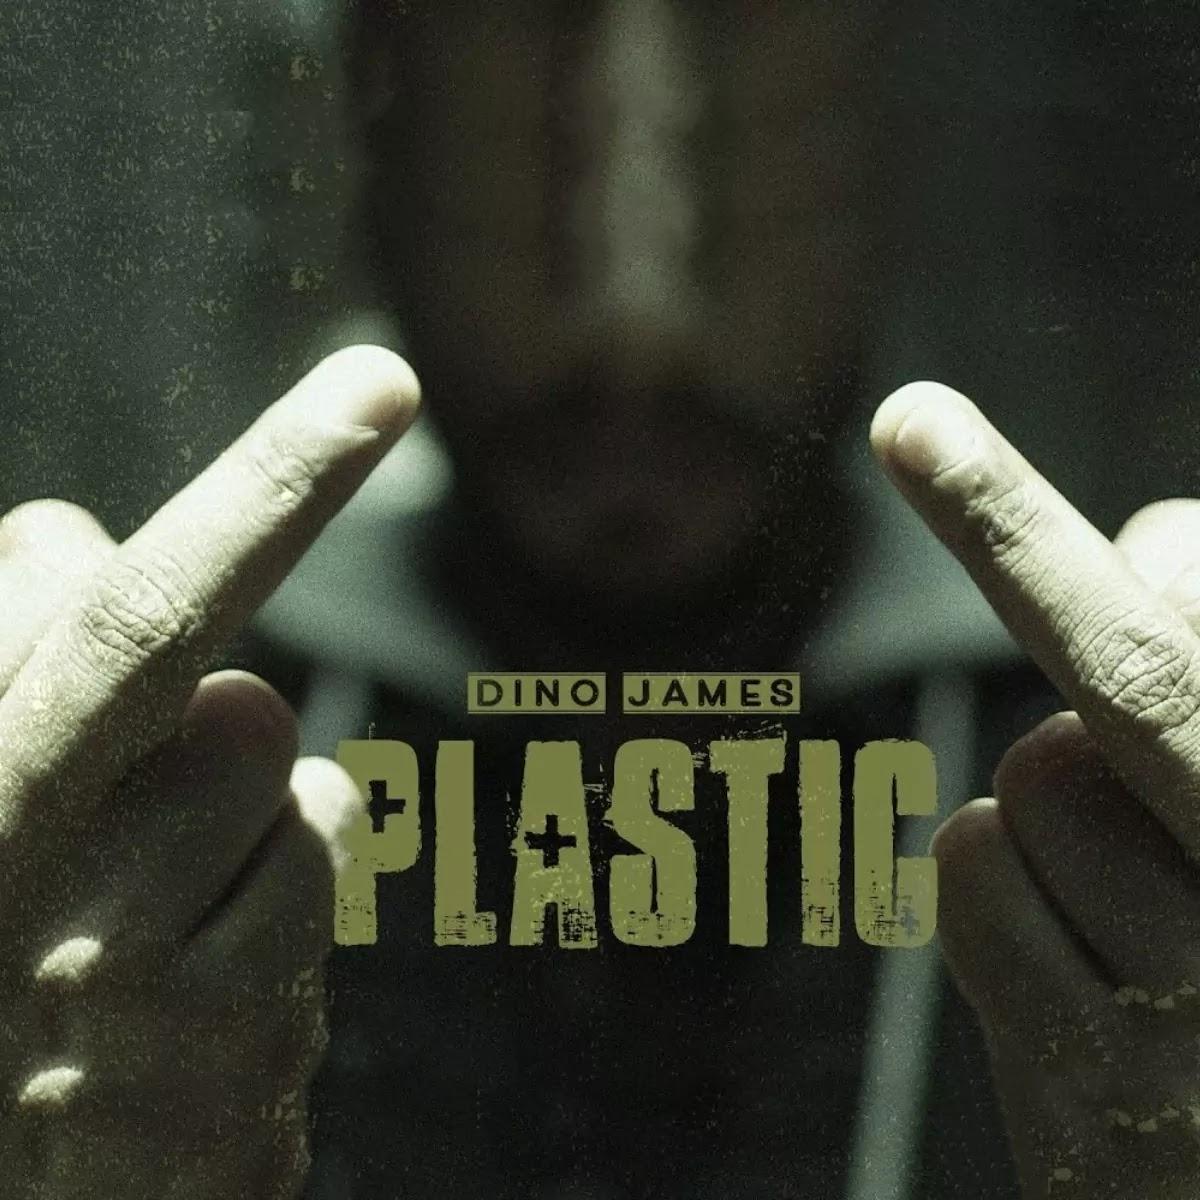 Plastic Dino James Song Download Mp3 320kbps